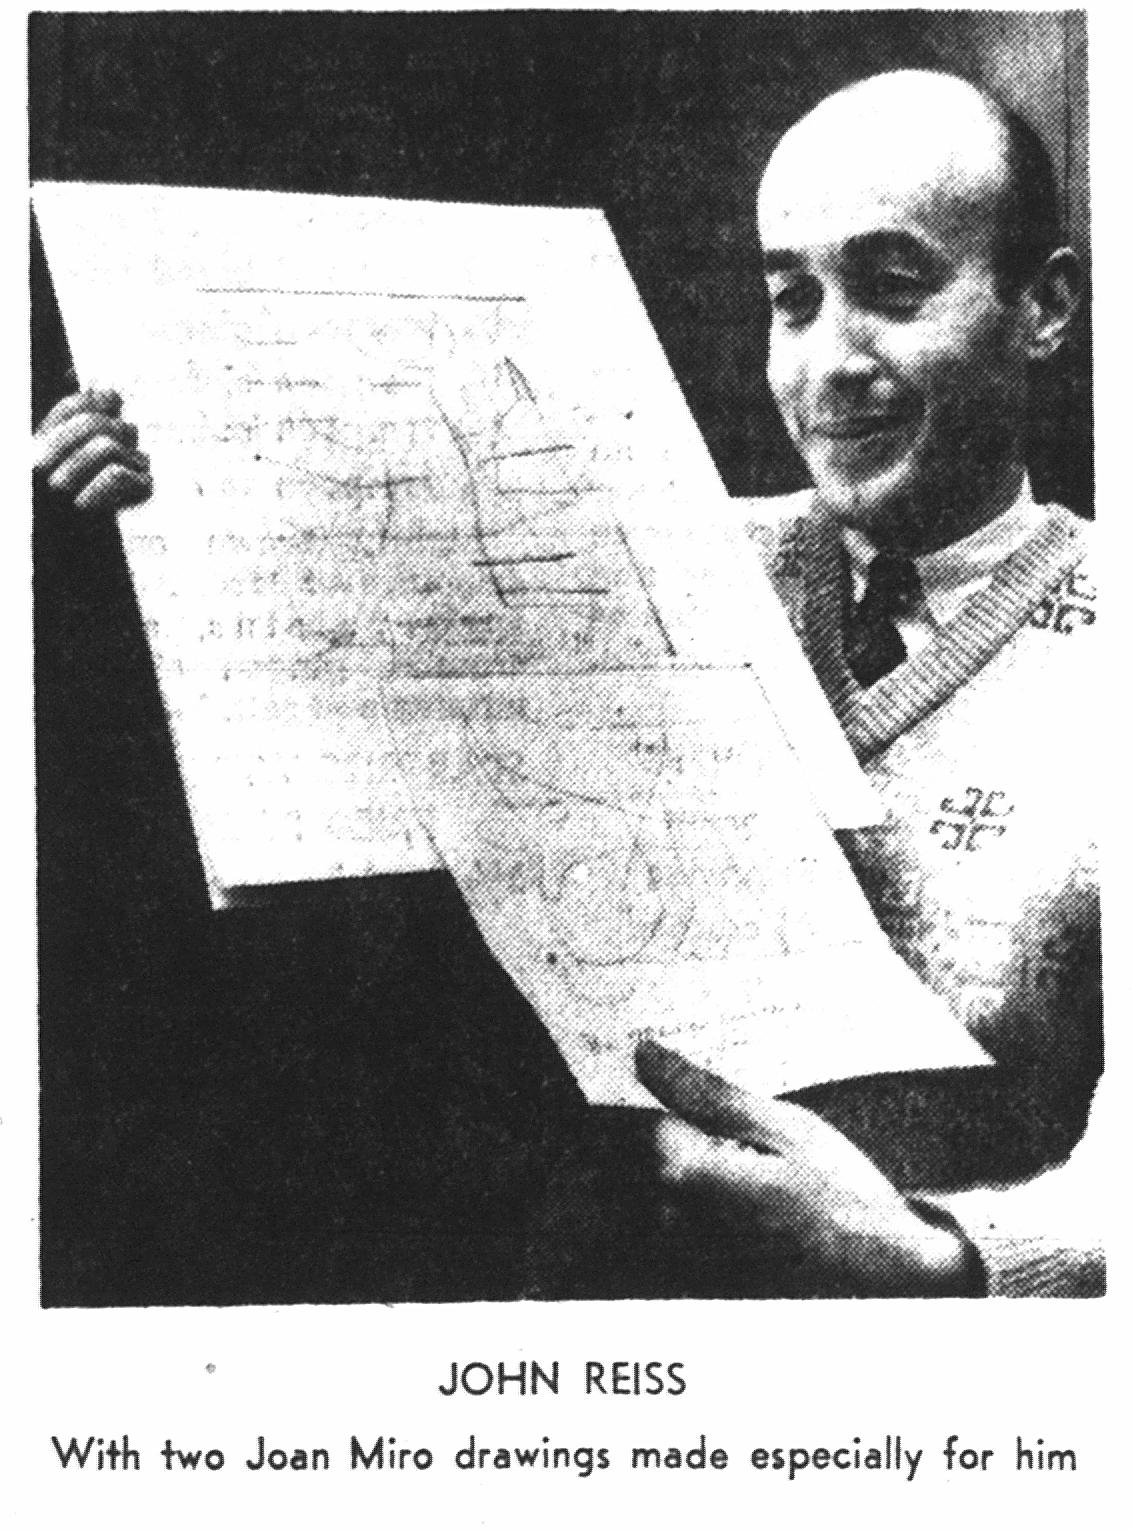 Photo from the Milwaukee Sentinel, January 28, 1962